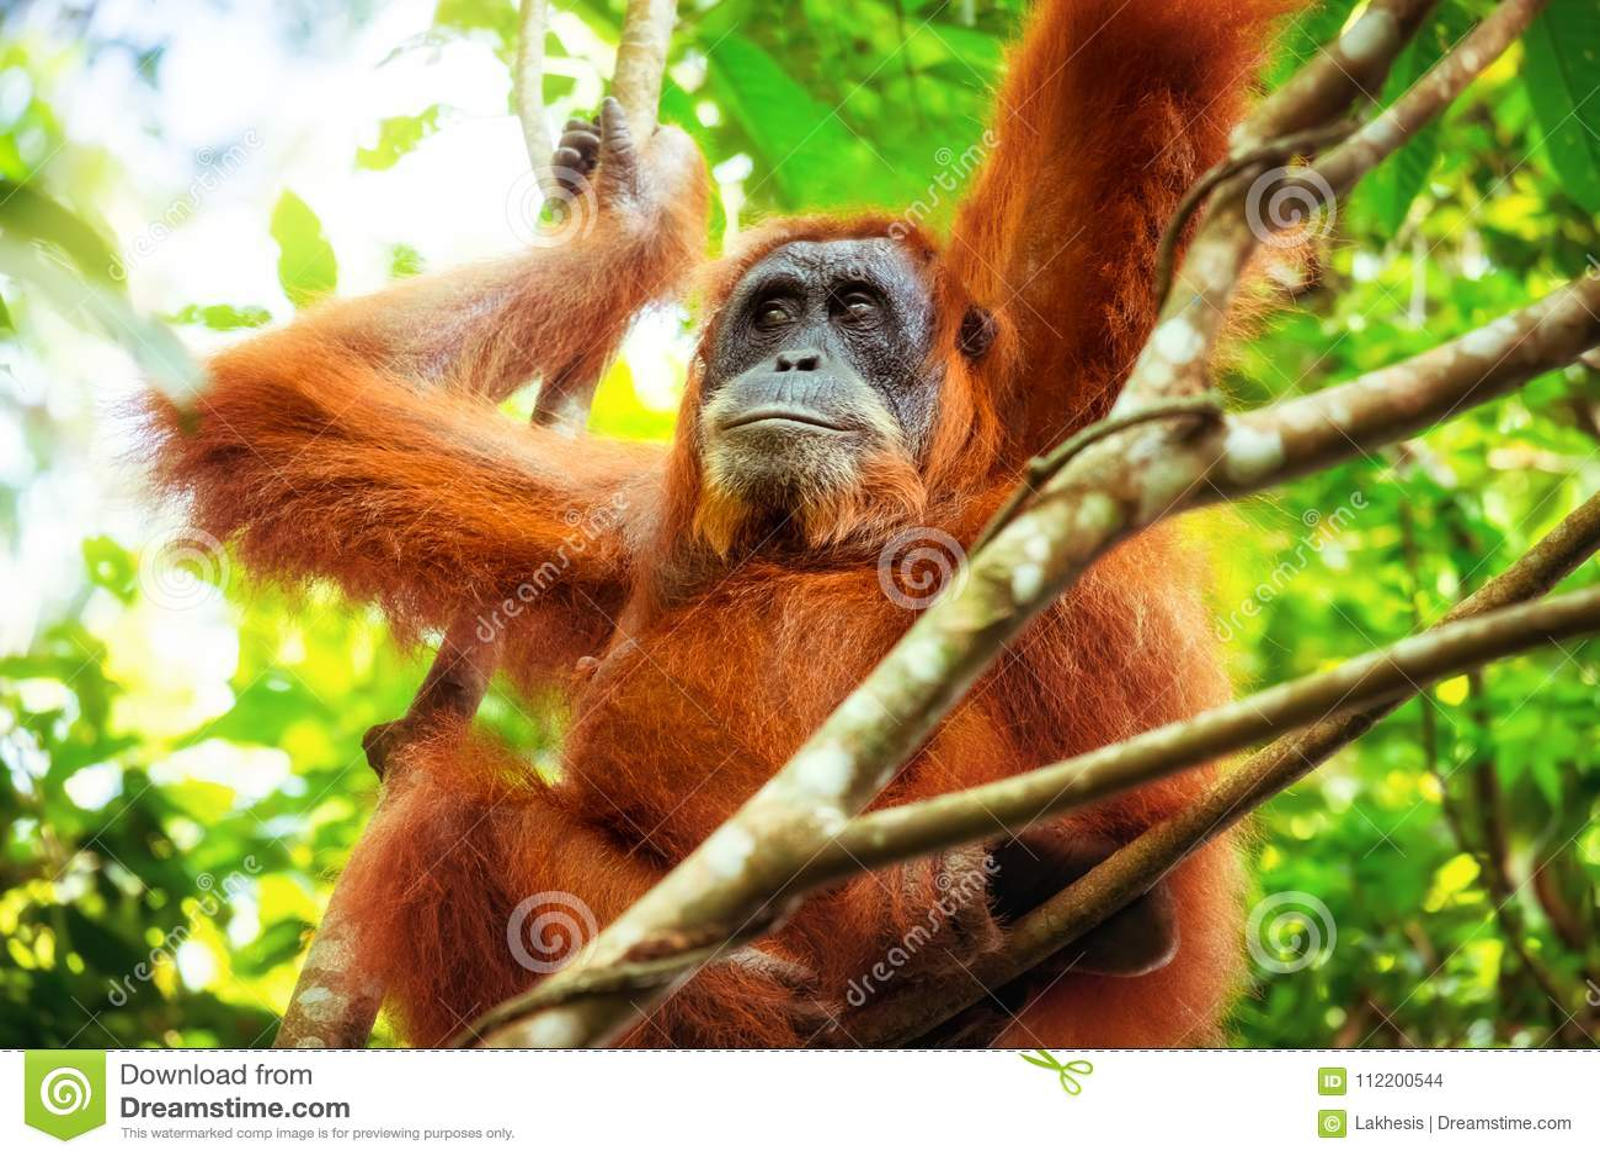 Female Orangutan Eating Bamboo Looking At The Horizon